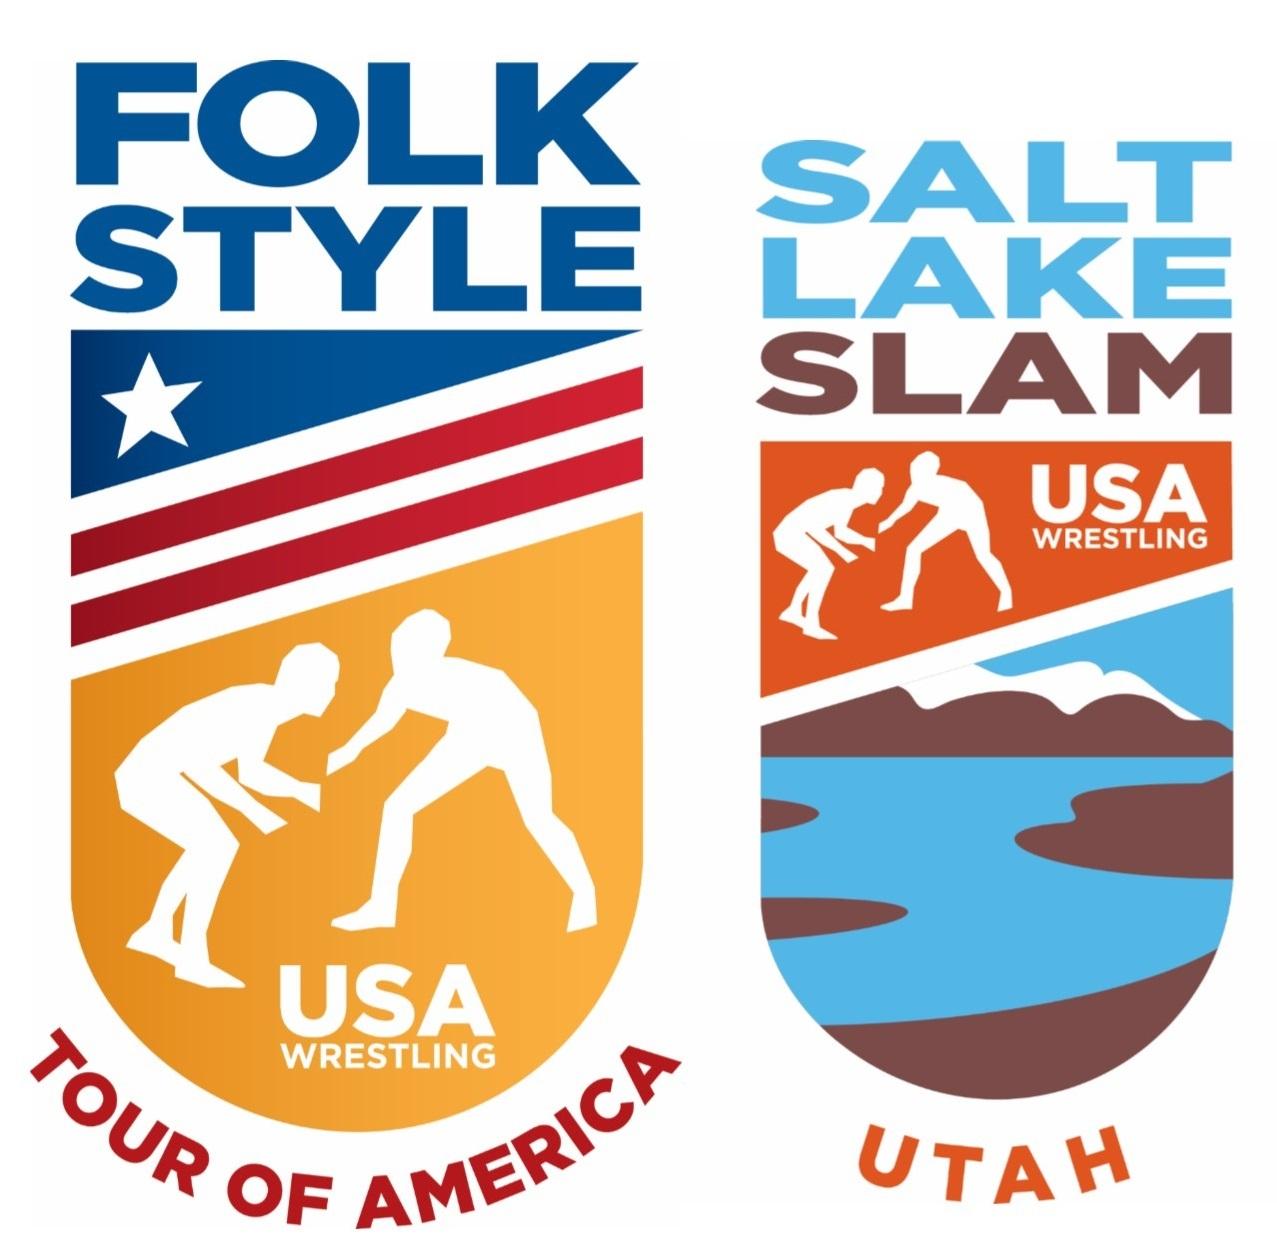 2019 Folkstyle Tour of America Salt Lake Slam